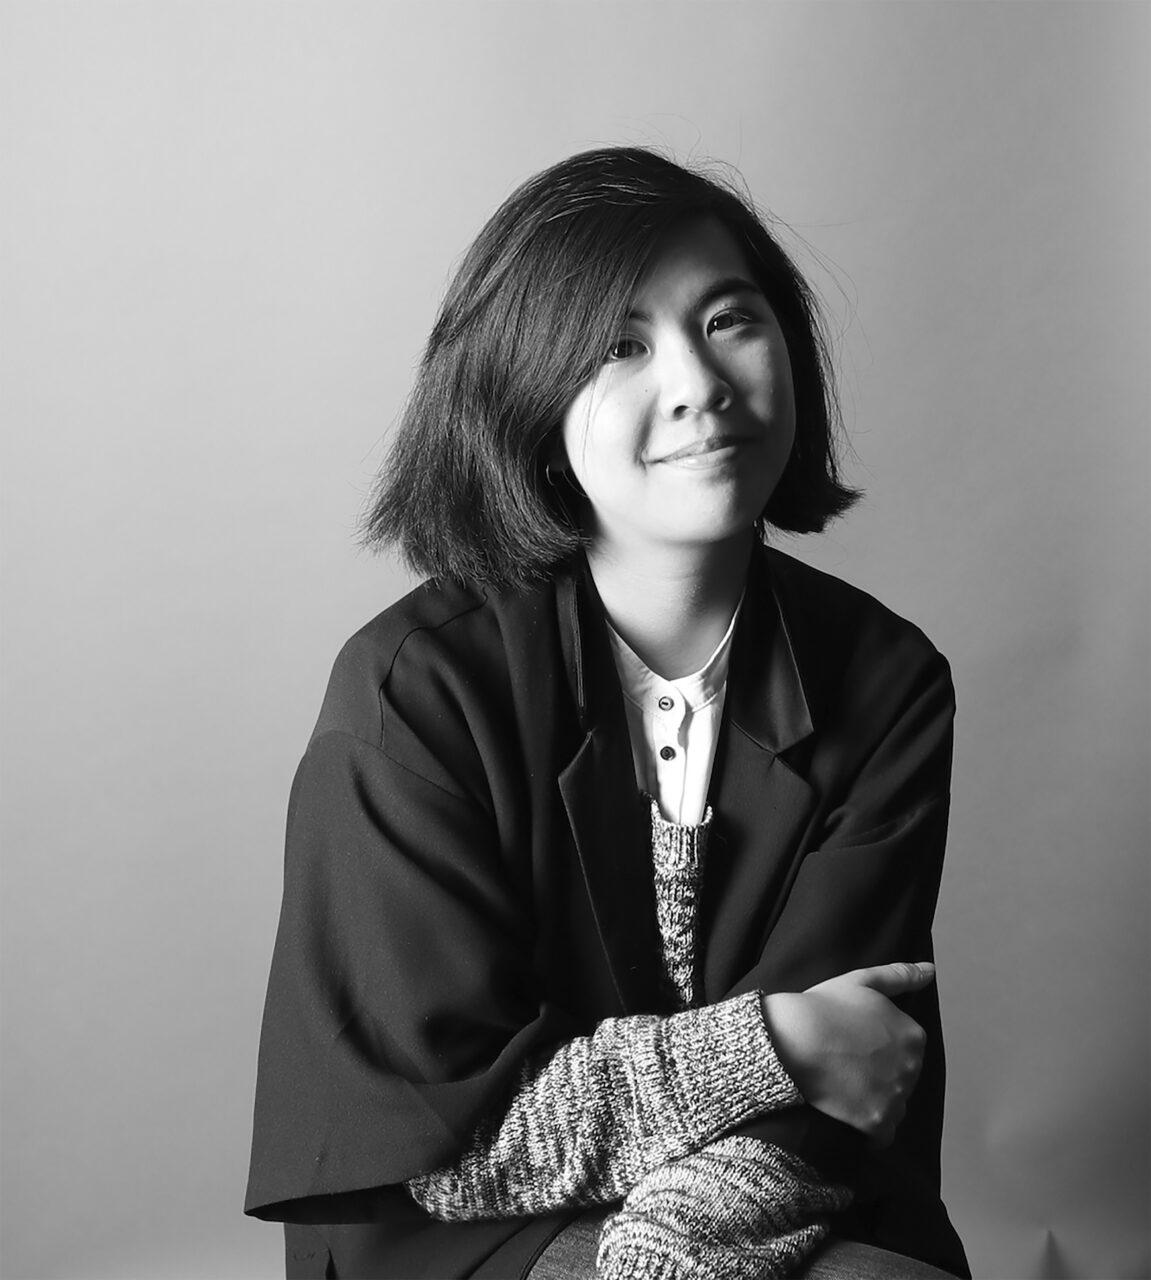 Lumen Nguyen